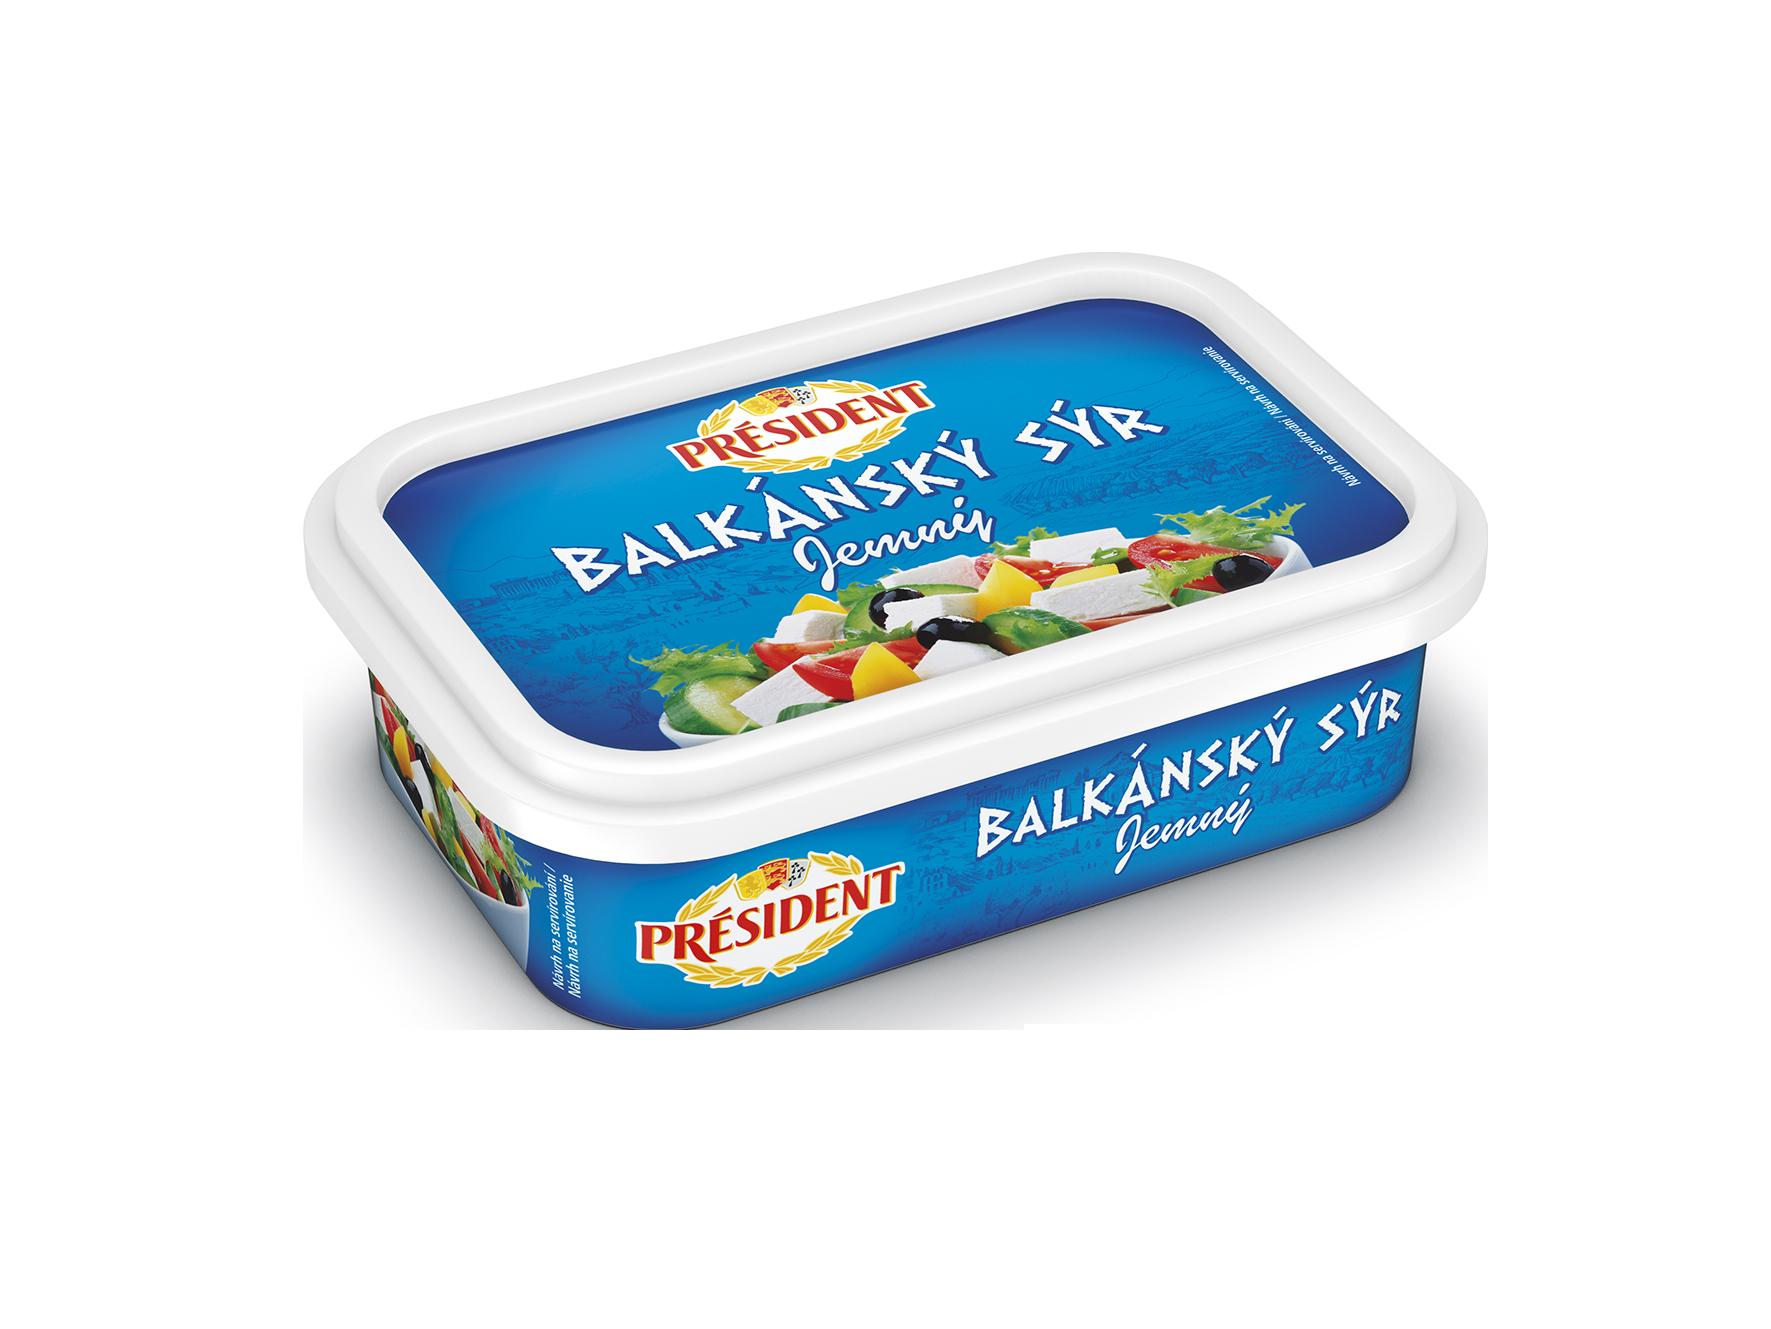 balknsk-sr-150g